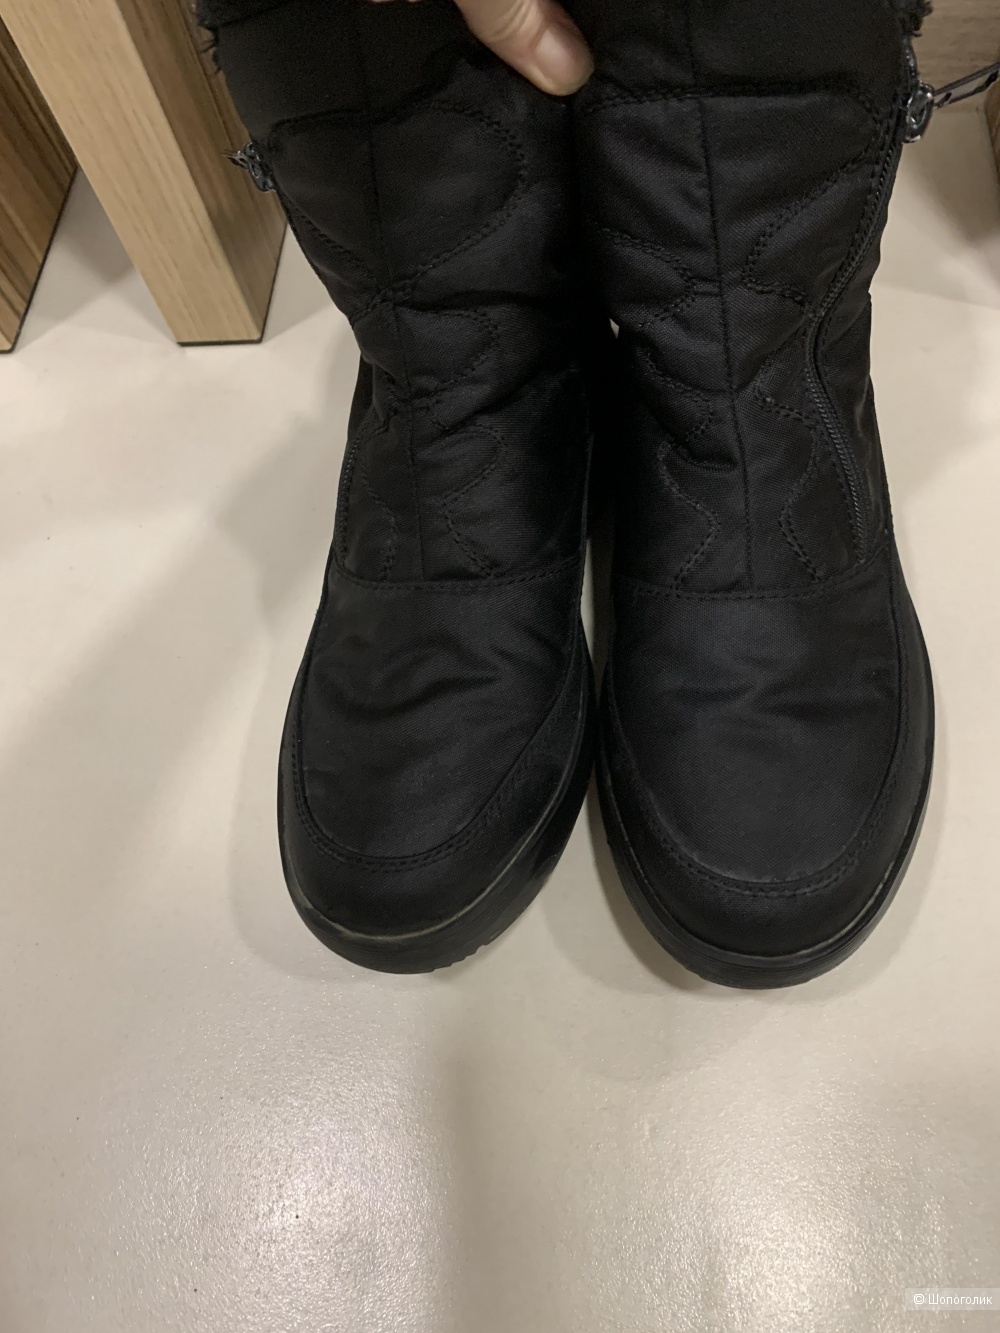 Сапоги зимние Walkmaxx, размер 38